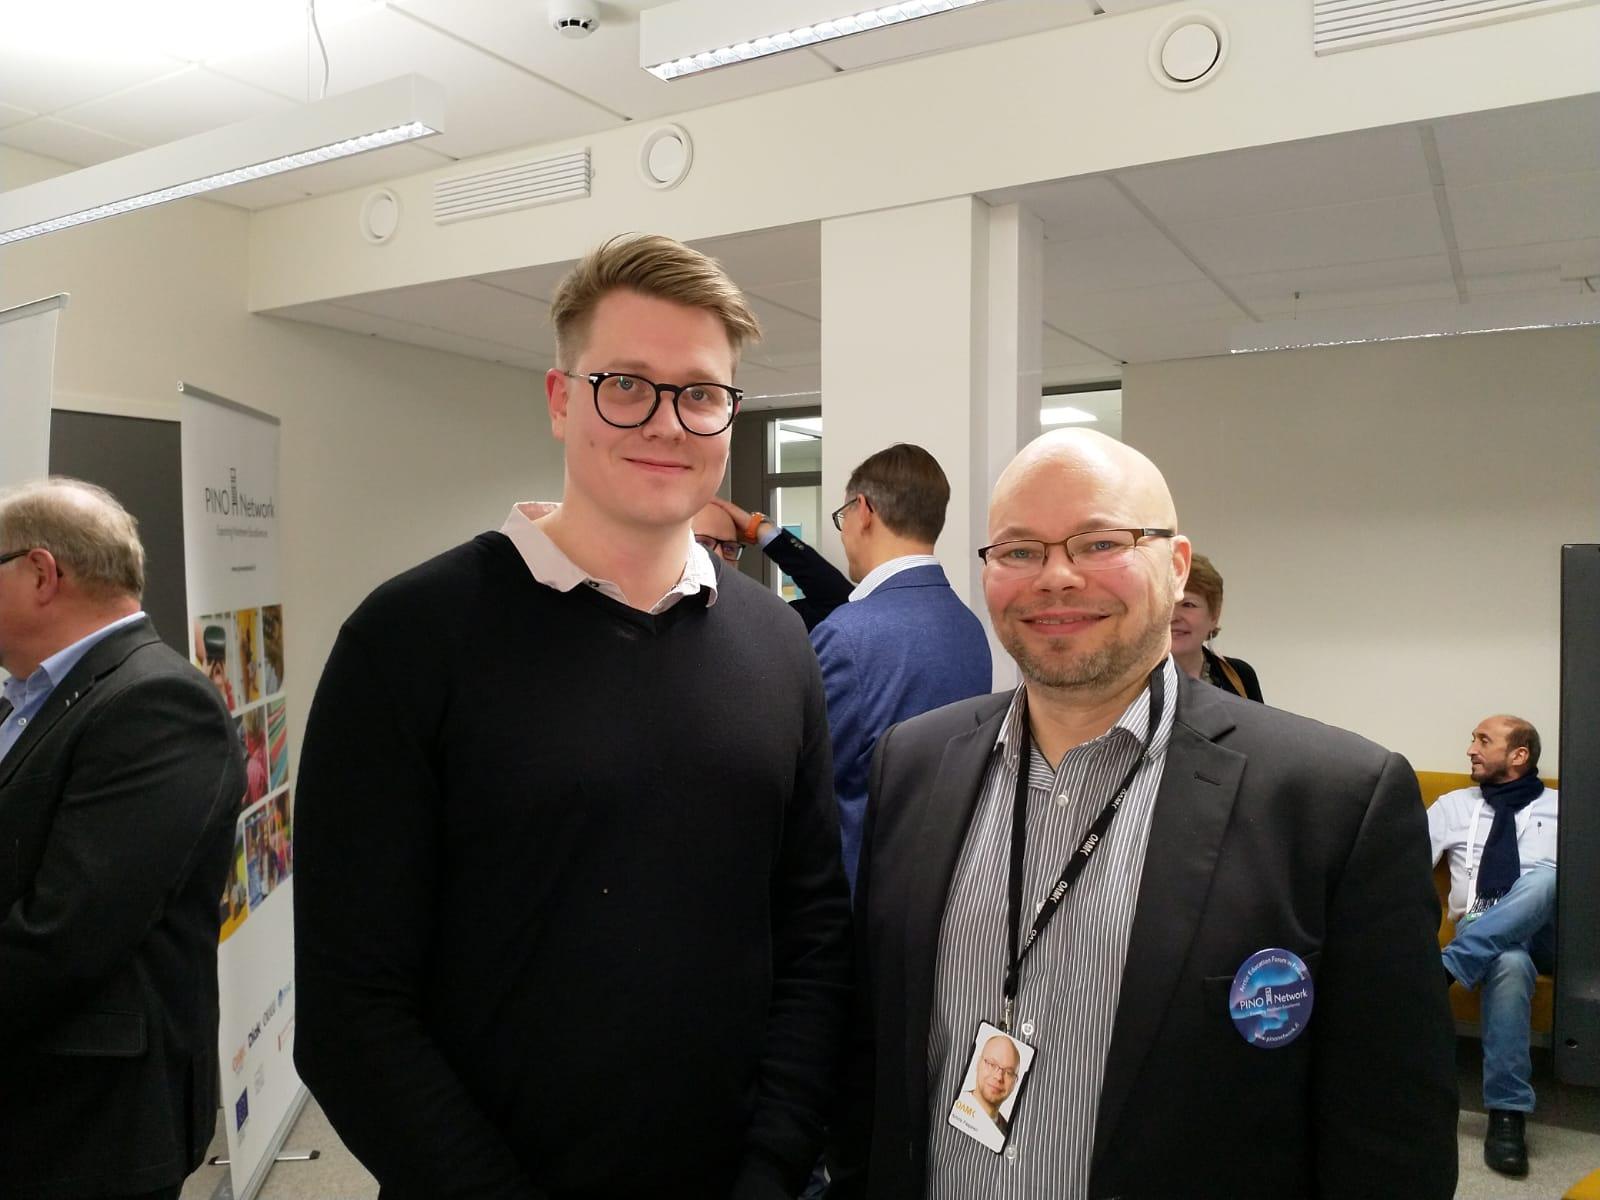 Henri Karjalainen, from Qridi (left) and Kimmo Paajanen, PINO Network